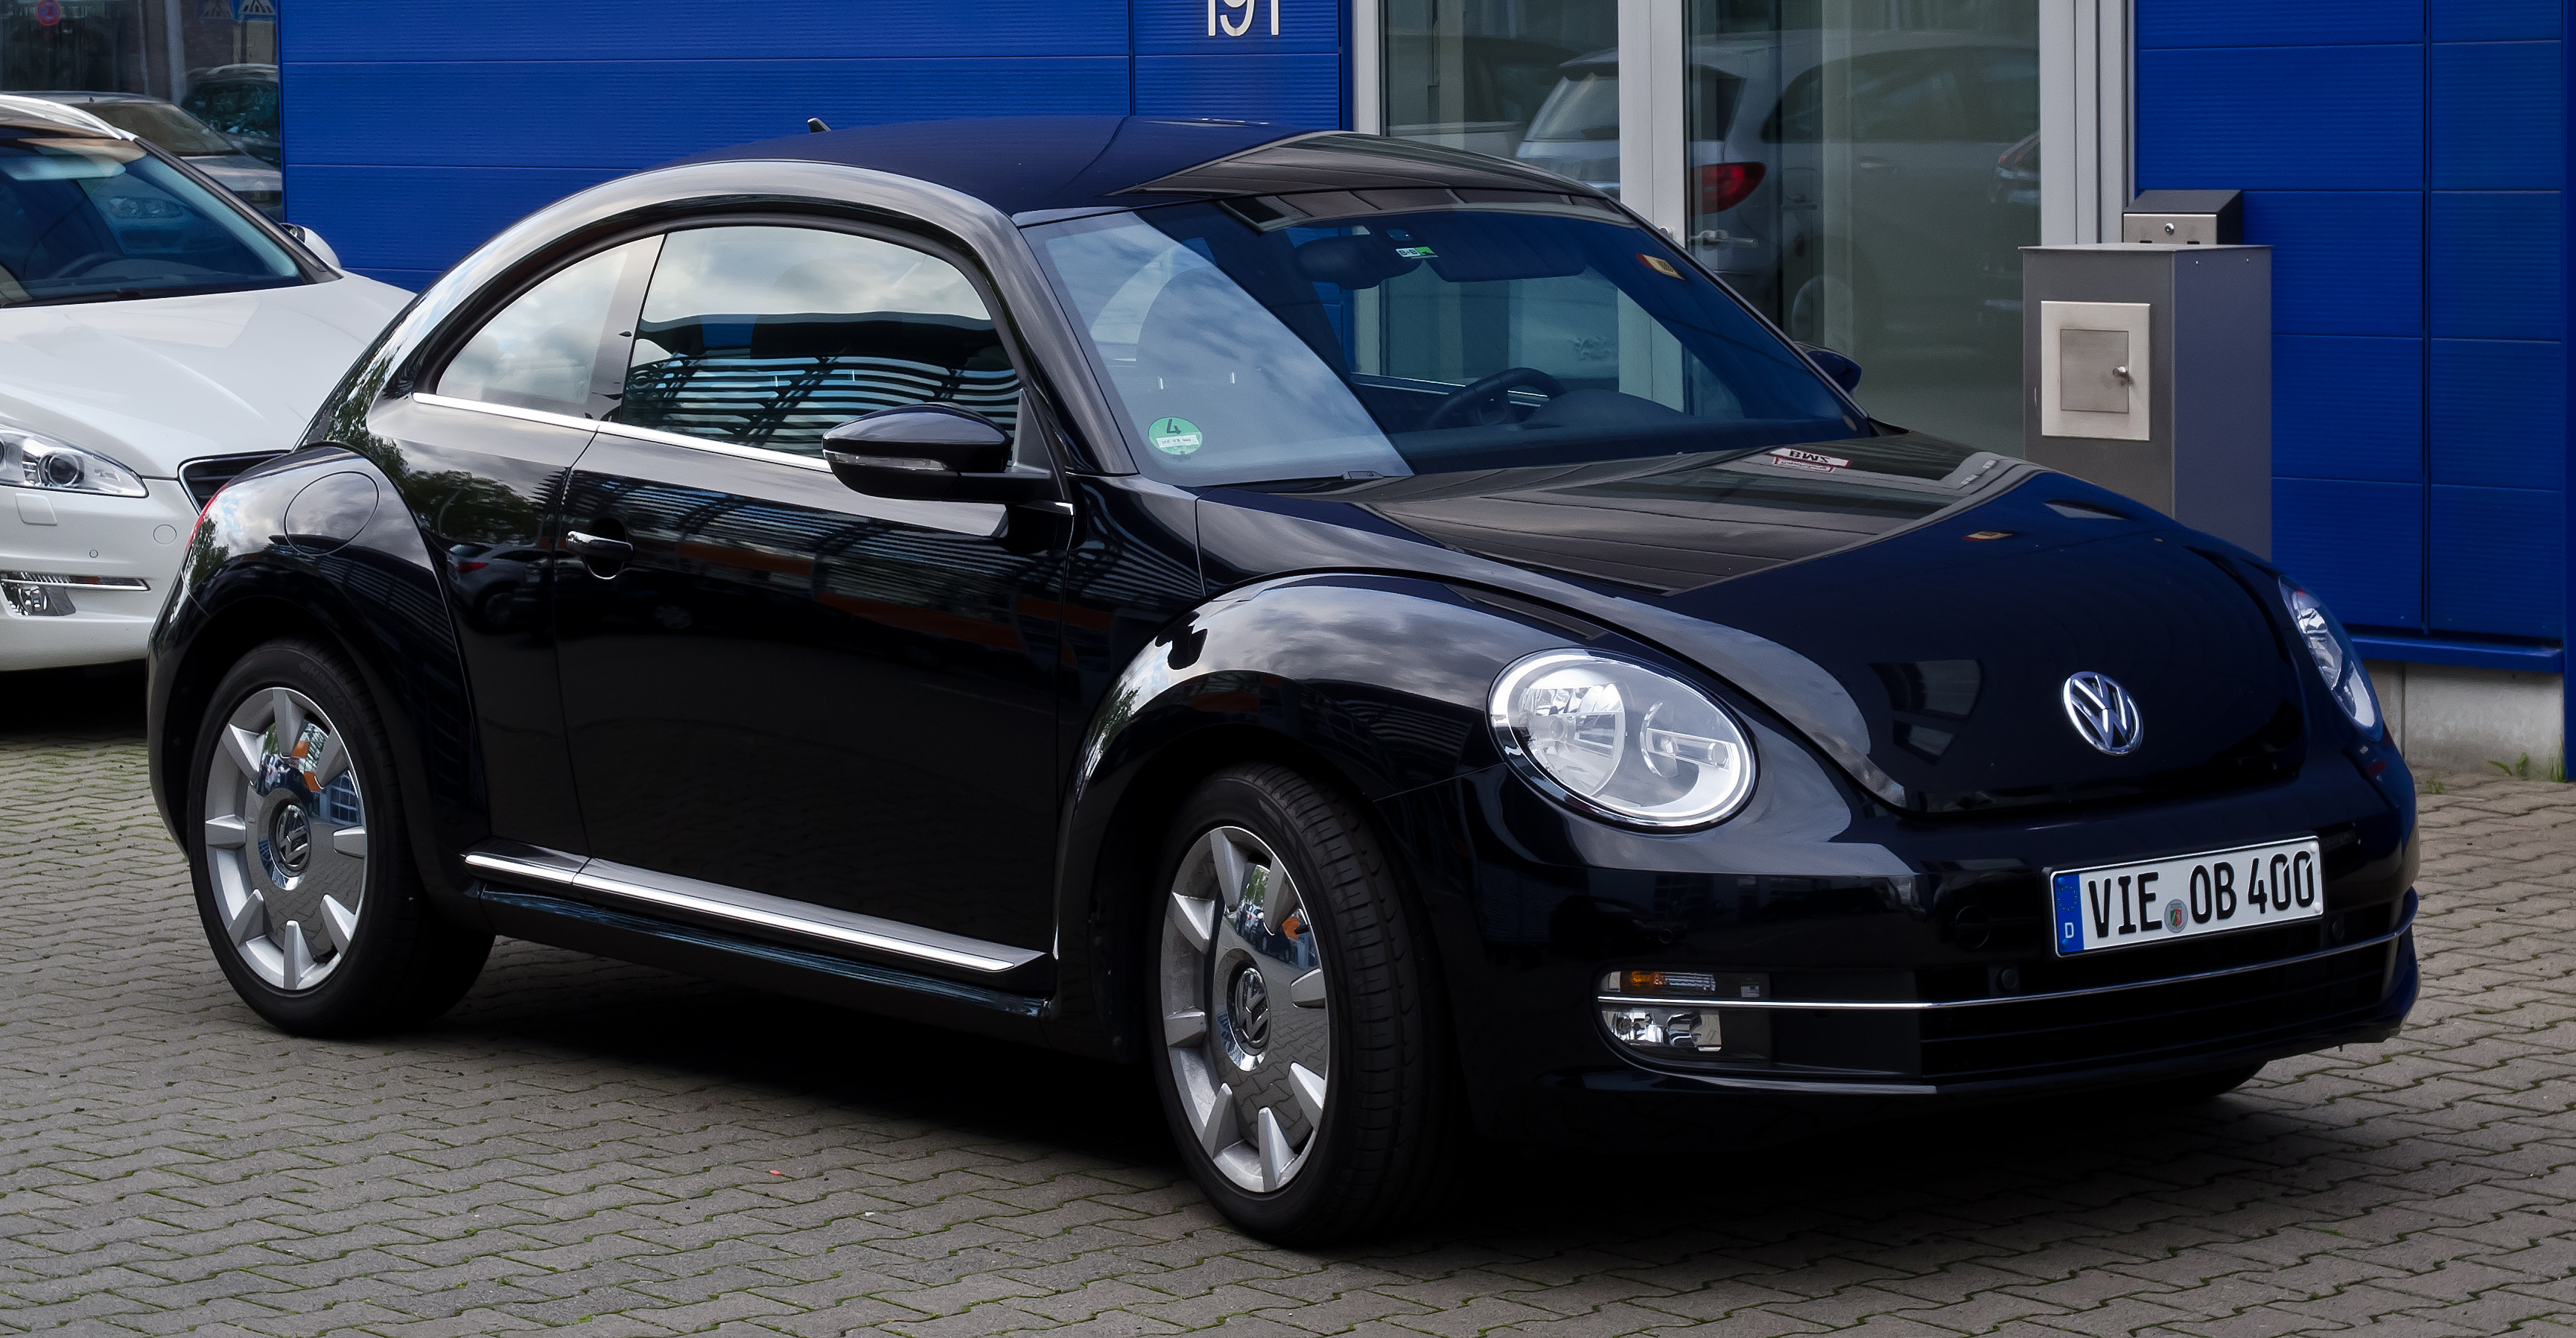 Who Designed The Vw Beetle >> Archivo:VW Beetle Design – Frontansicht, 8. Juli 2012